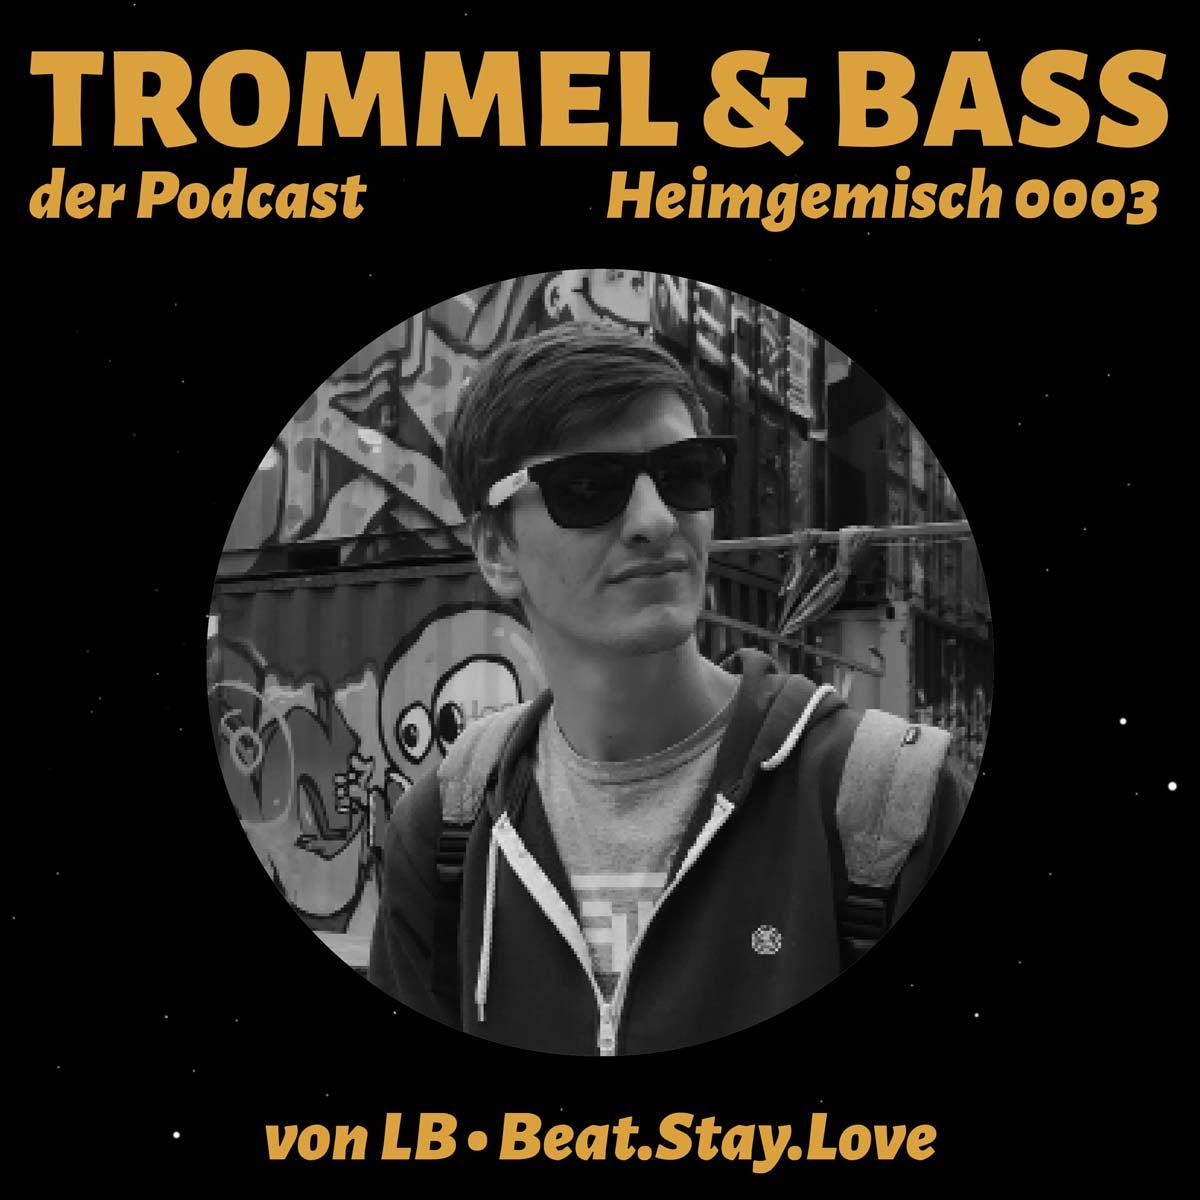 HG-003-LB-Trommel-Bass